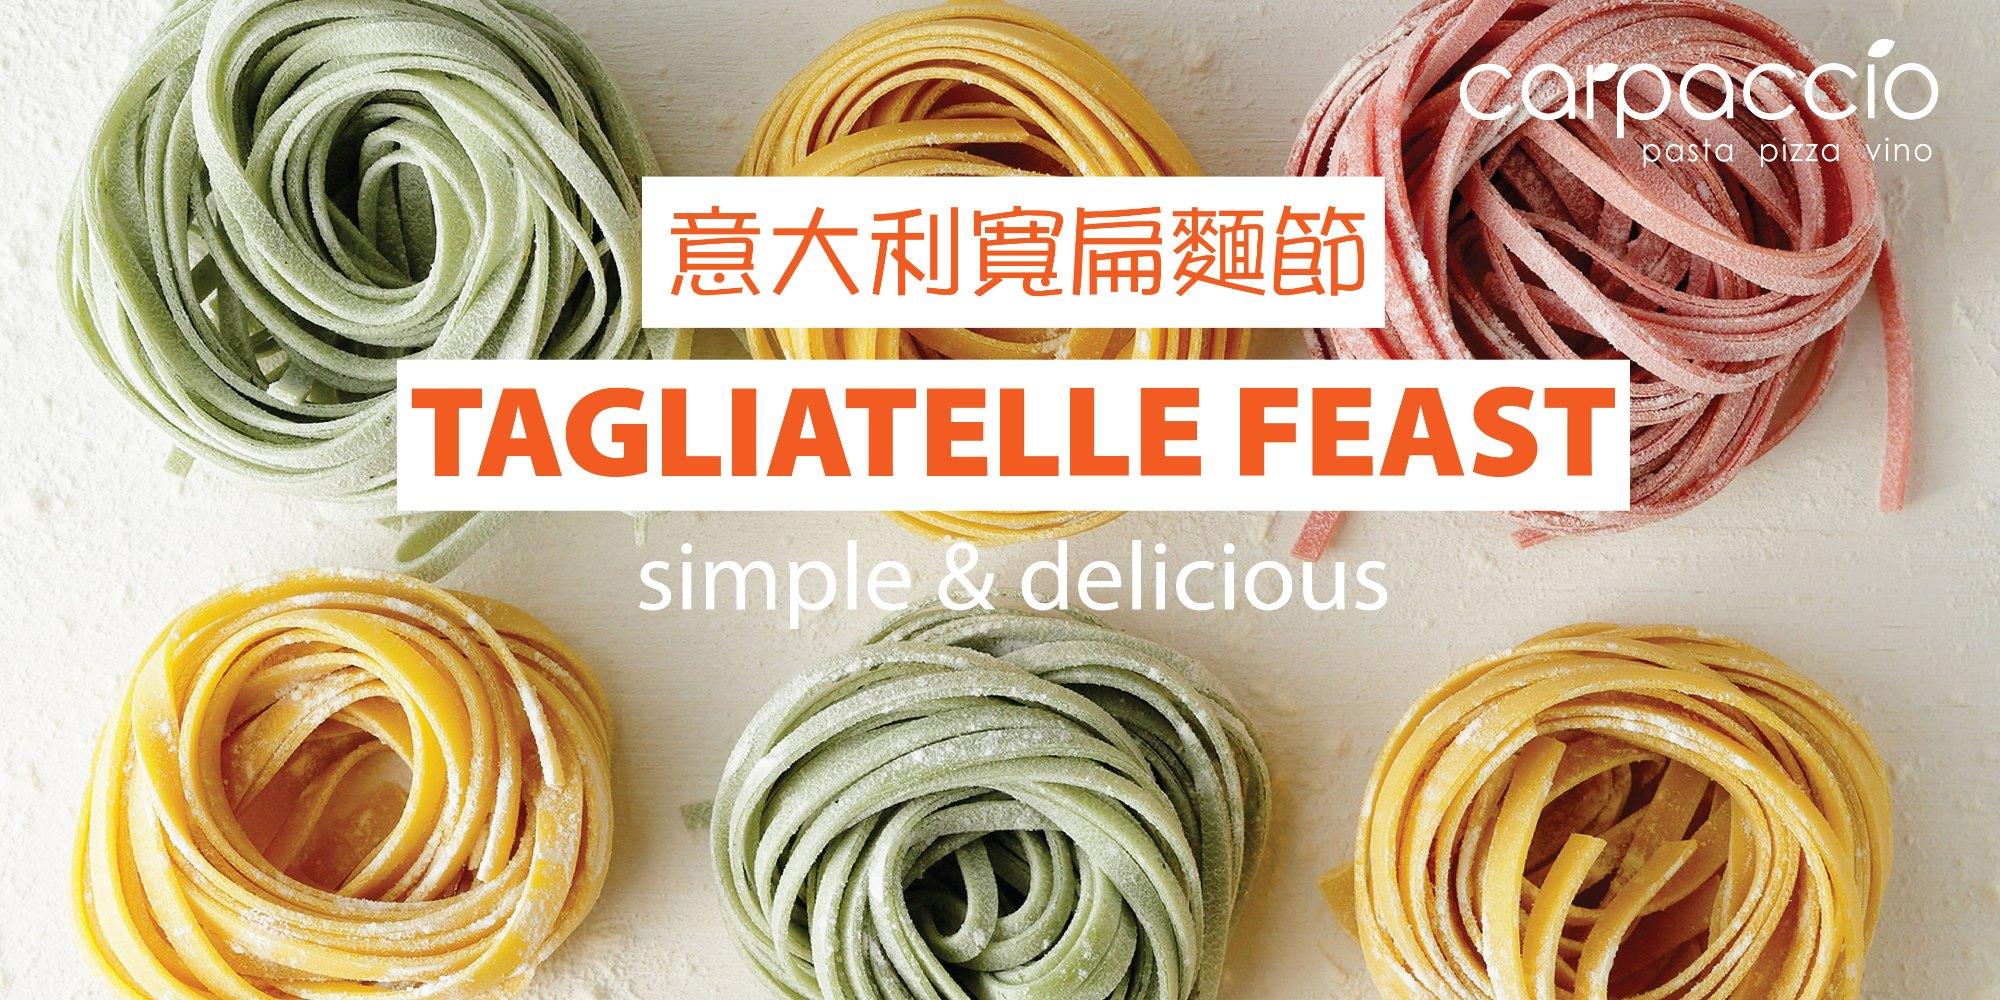 Tagliatelle-web-02-02-02